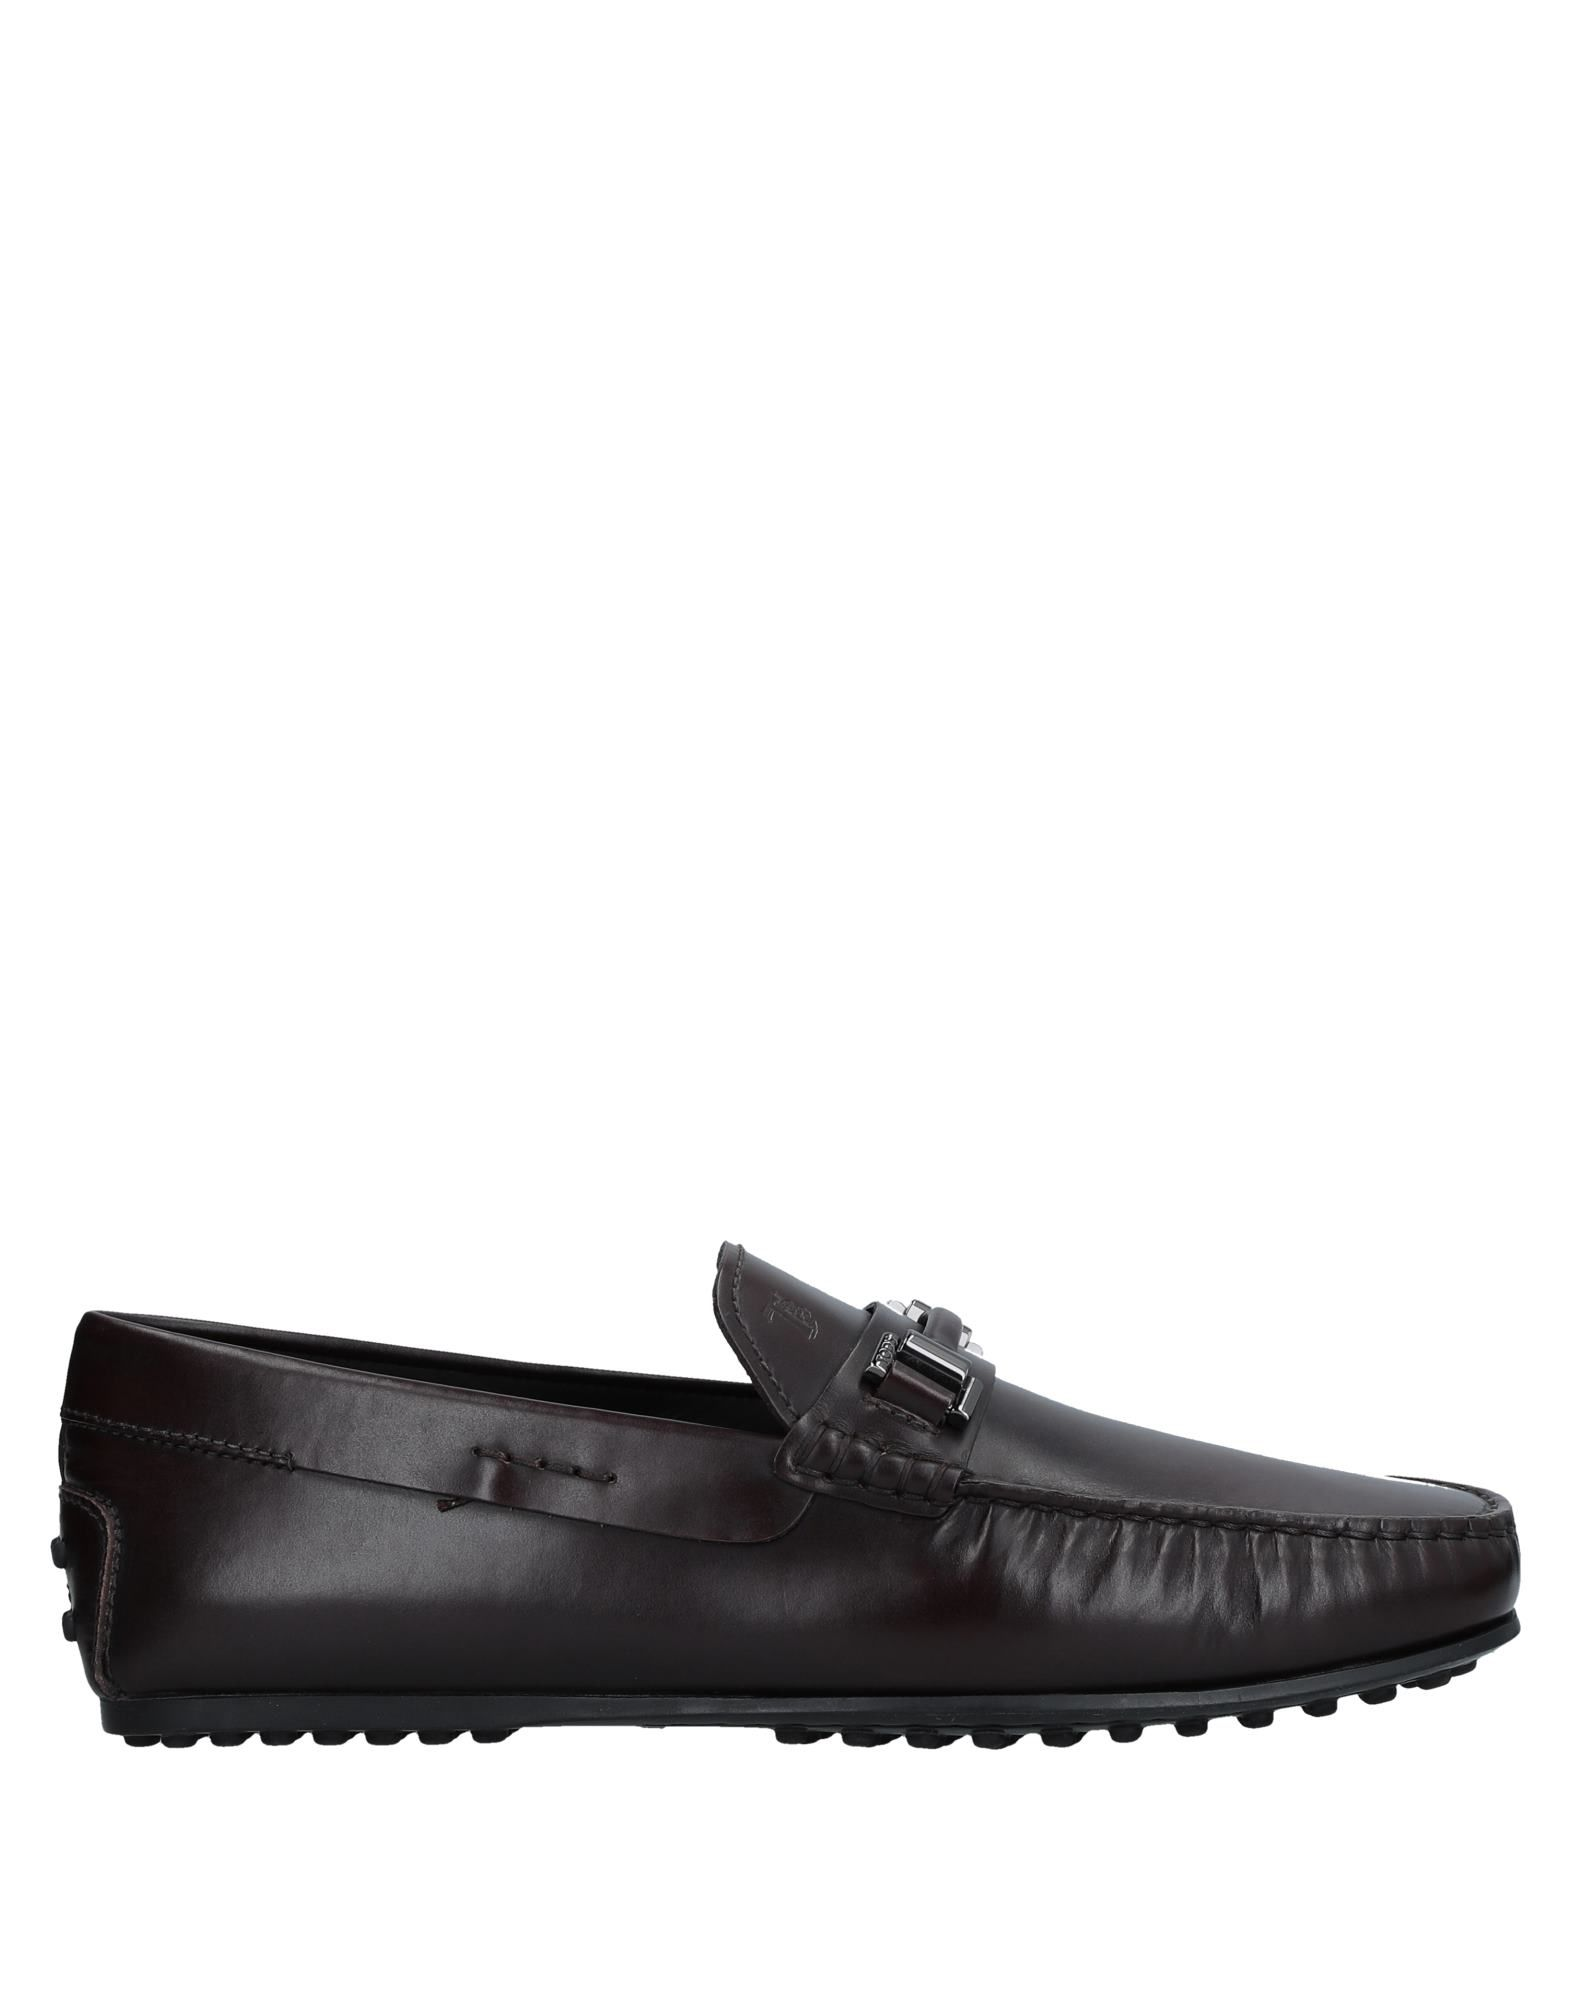 Tod's Mokassins Herren  11543994DX Gute Qualität beliebte Schuhe